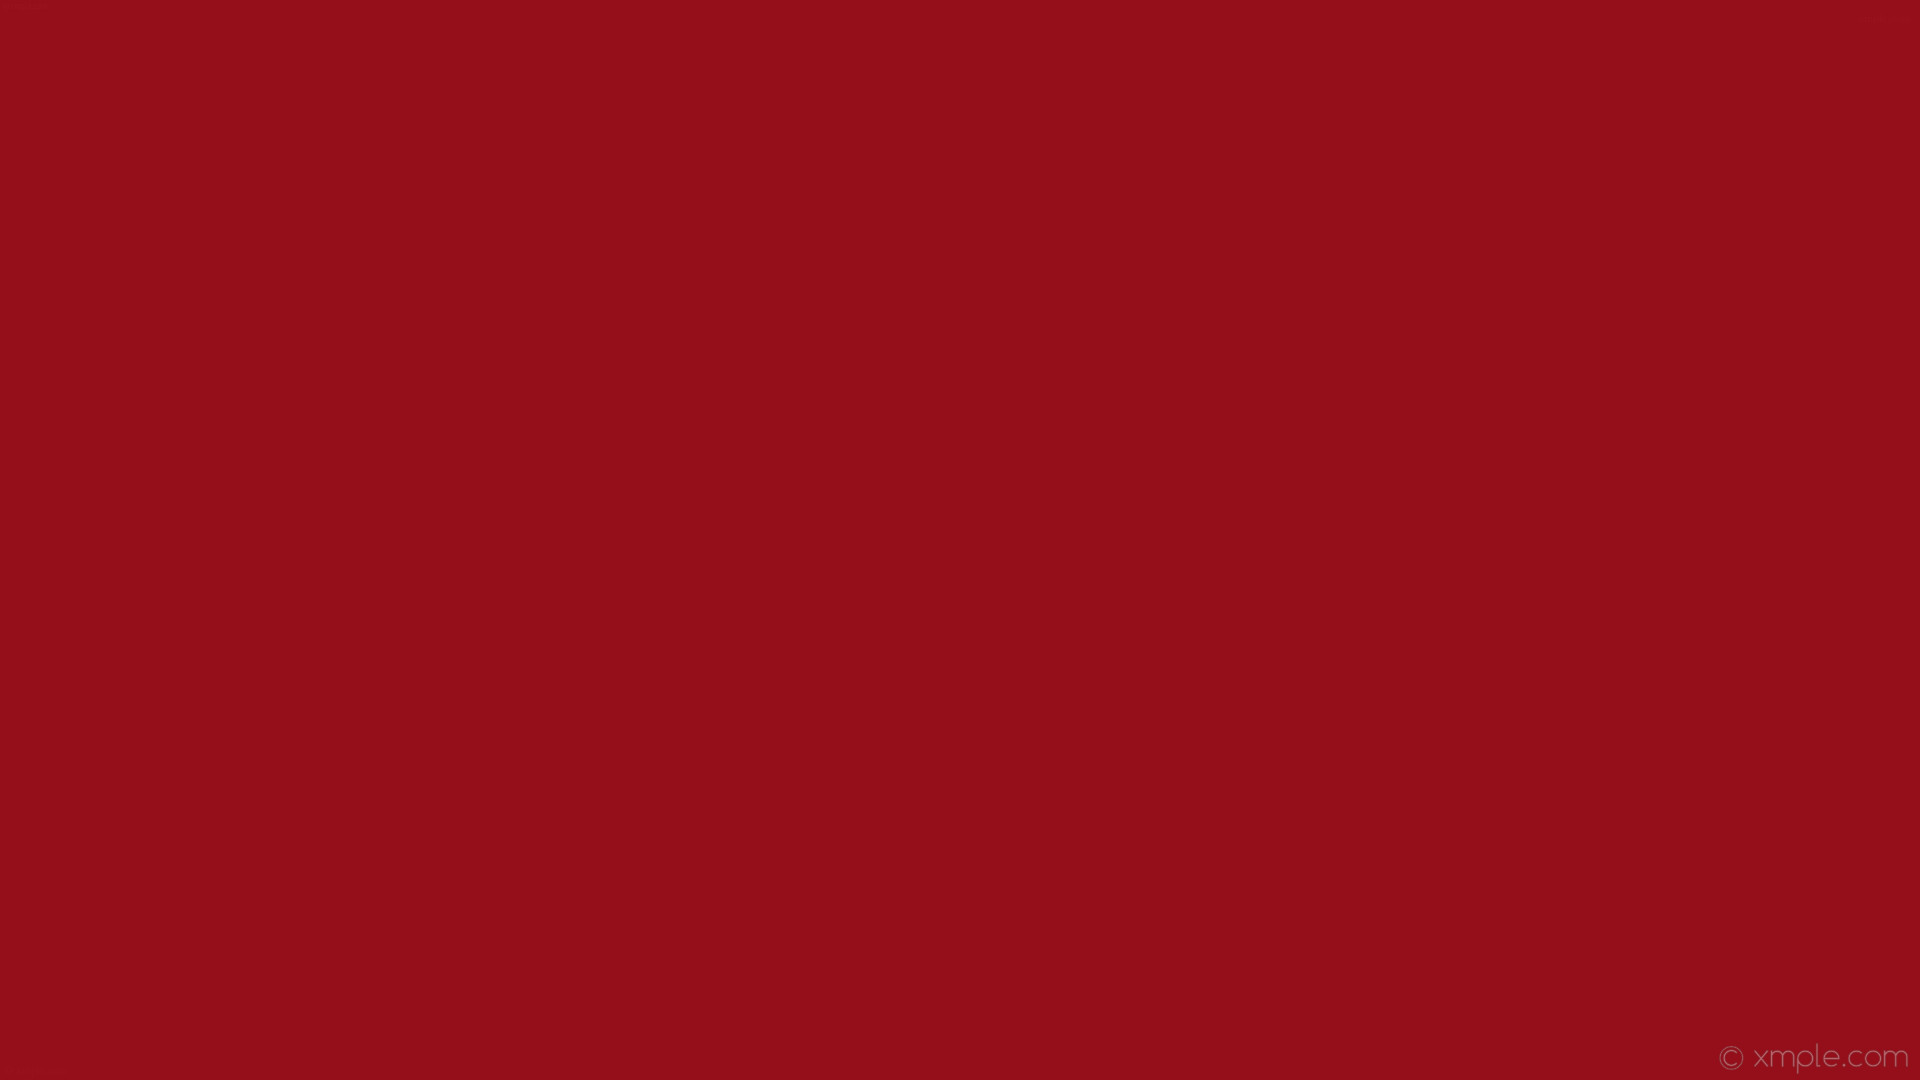 1920x1080 wallpaper gradient yellow linear pink deep pink light goldenrod yellow #ff1493 #fafad2 195°